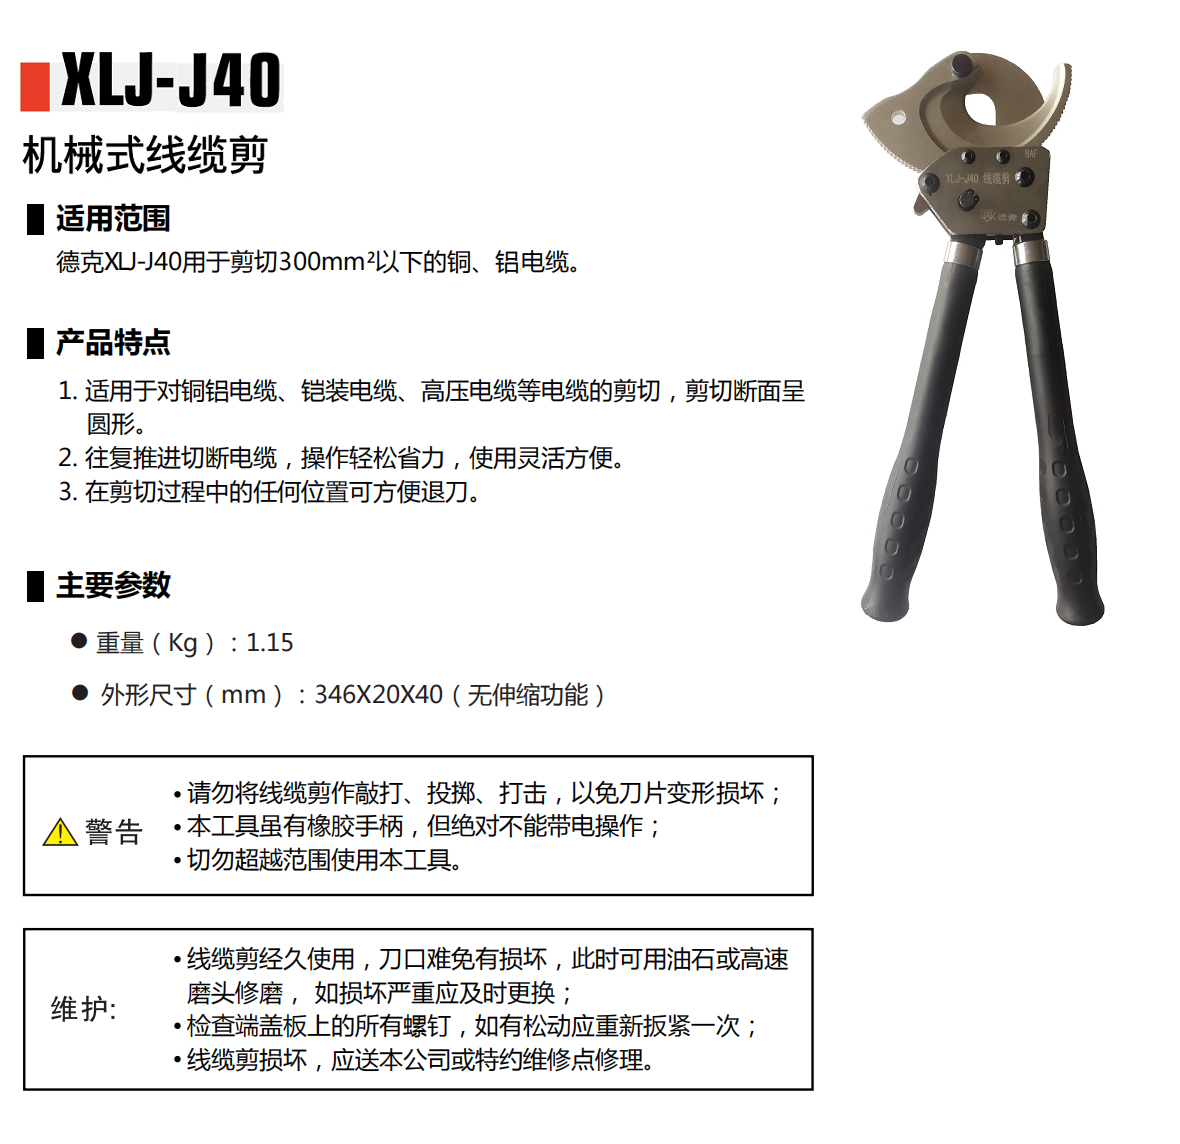 XLJ-J40详情.png